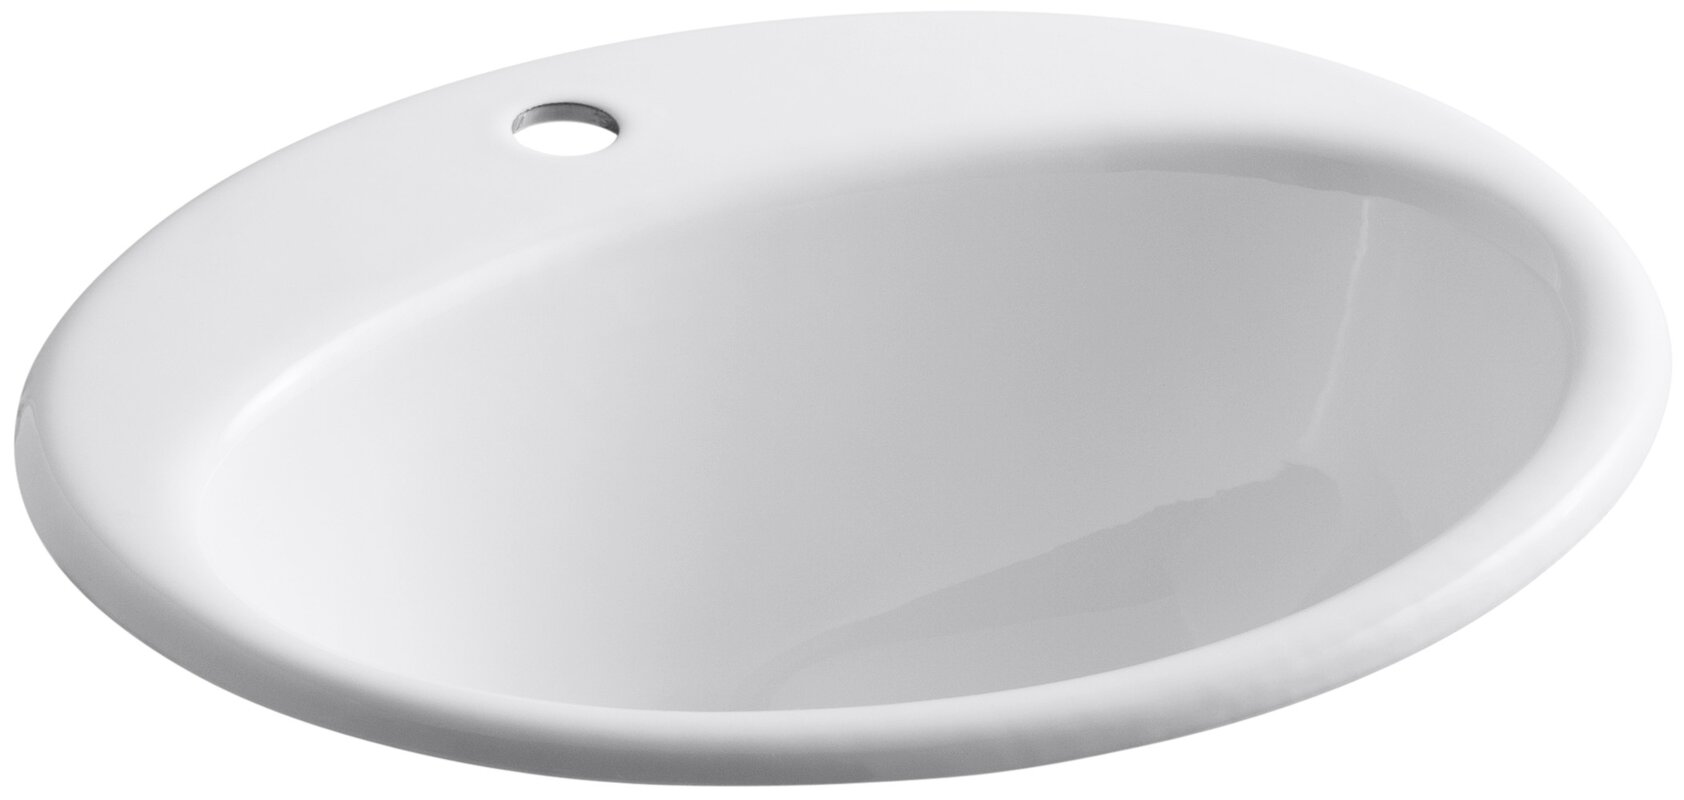 Farmington Metal Oval Drop-In Bathroom Sink with Overflow